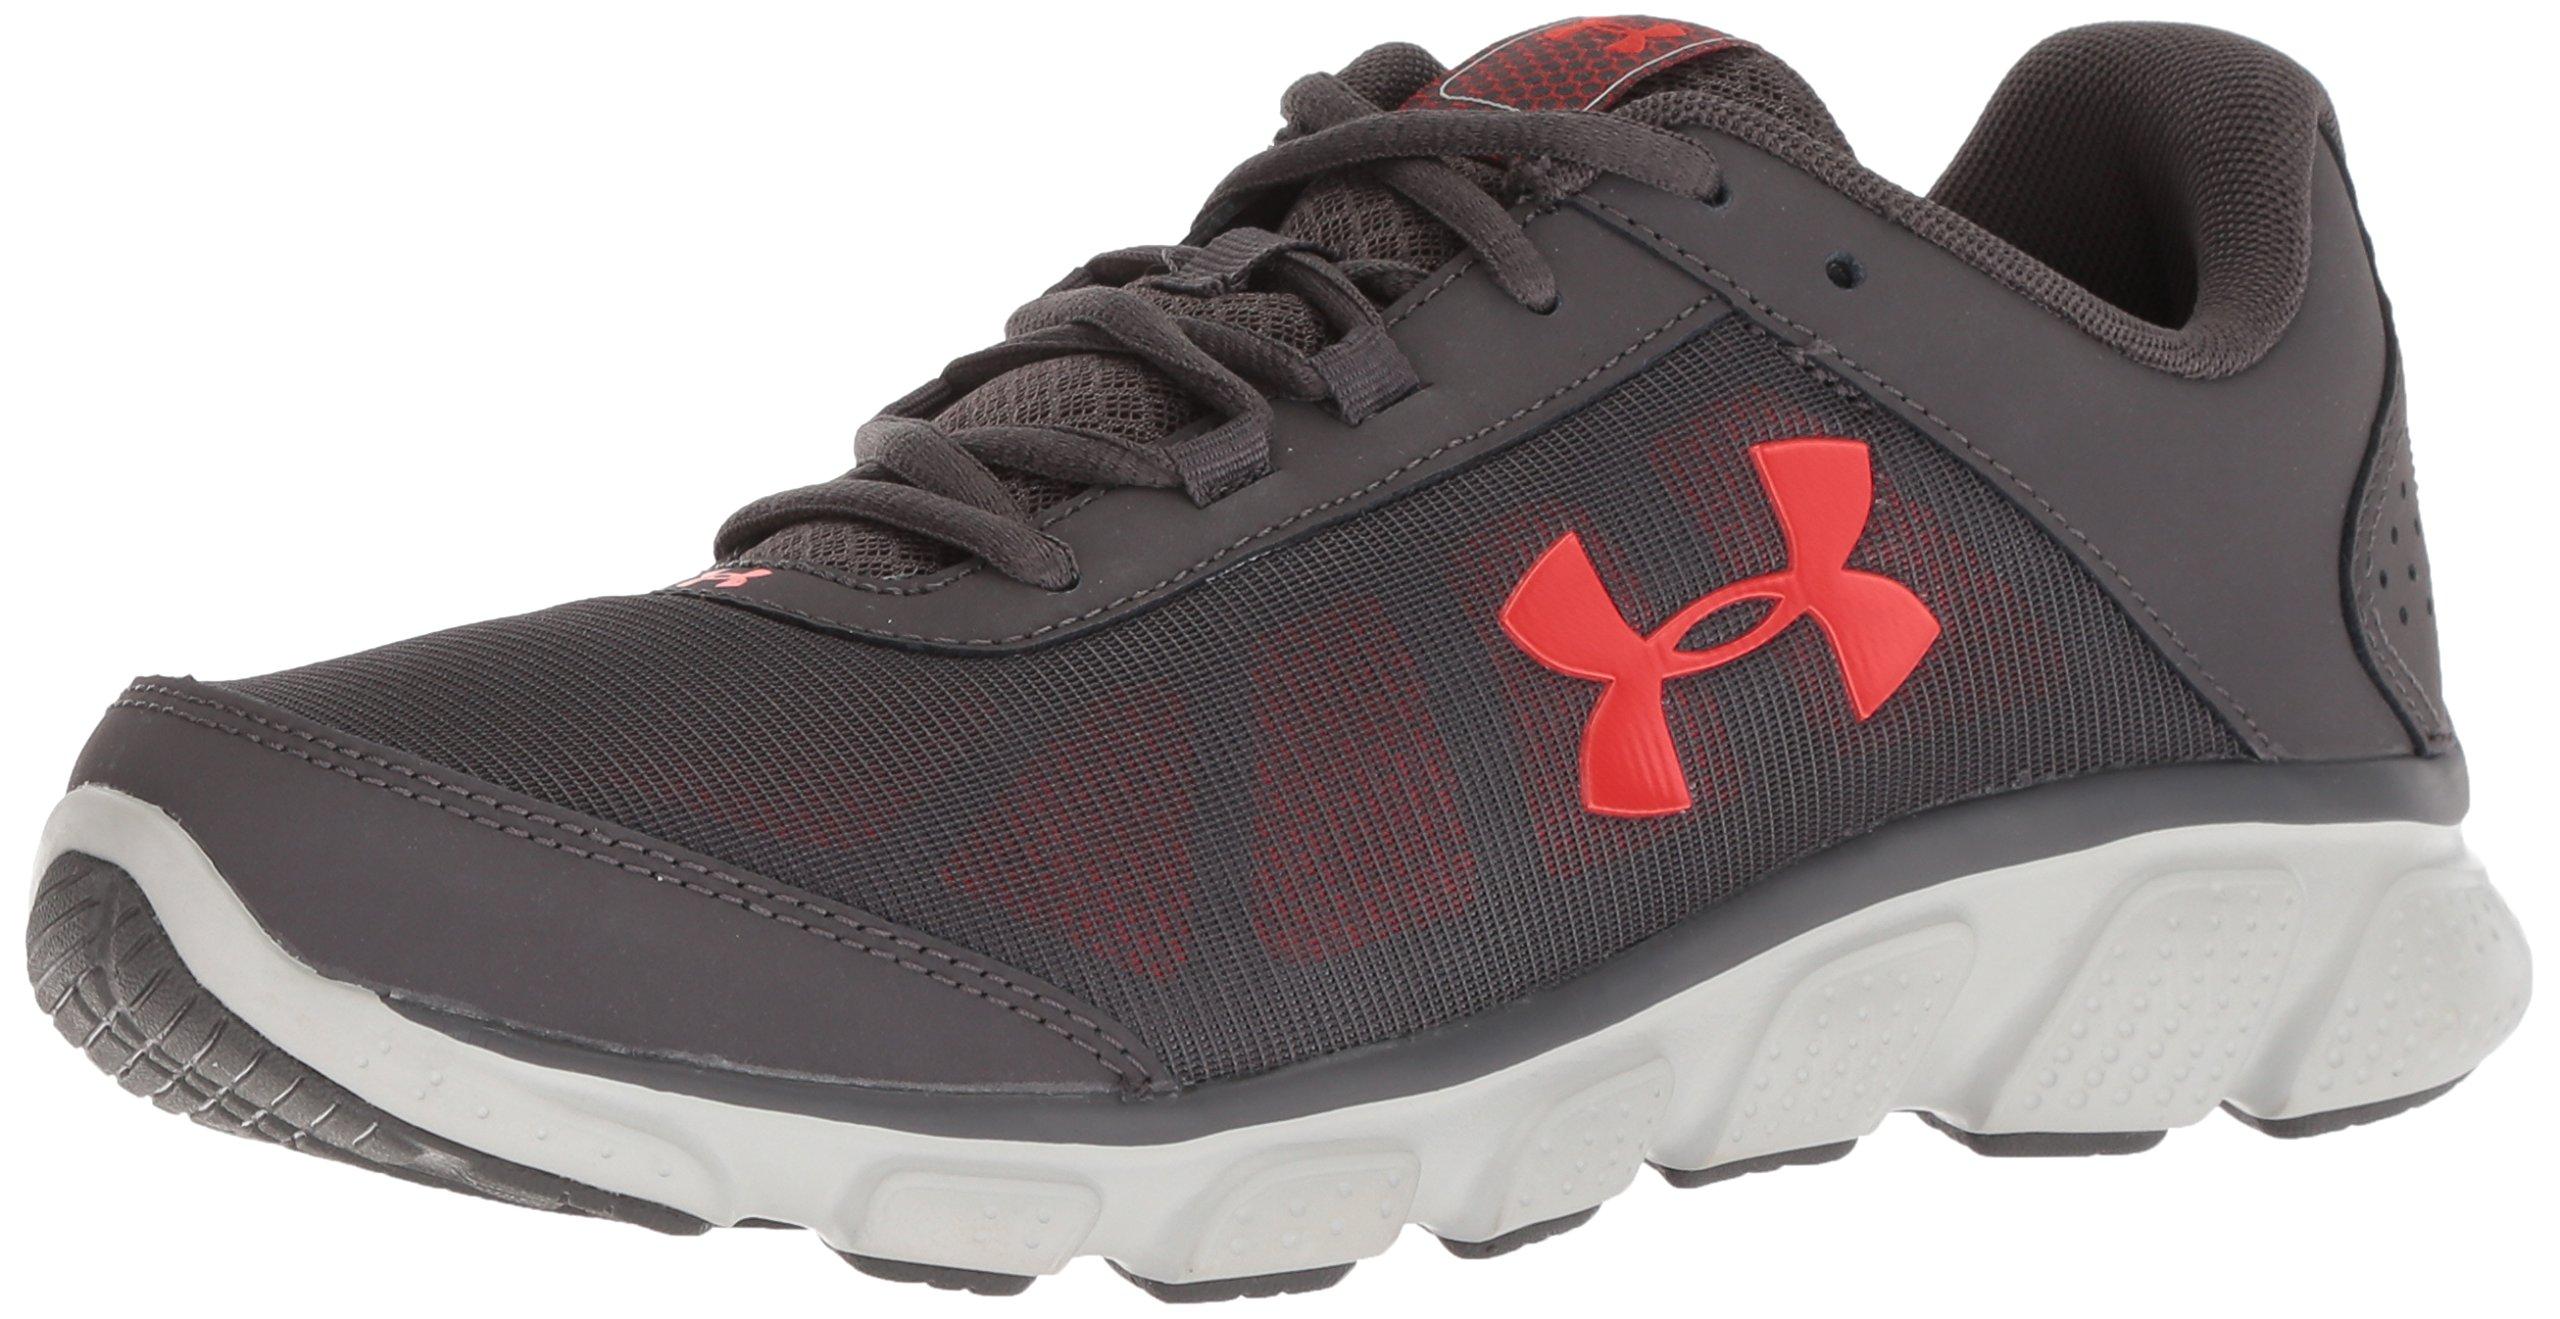 Under Armour Men's Micro G Assert 7 Running Shoe, Charcoal (102)/Radio Red, 14 M